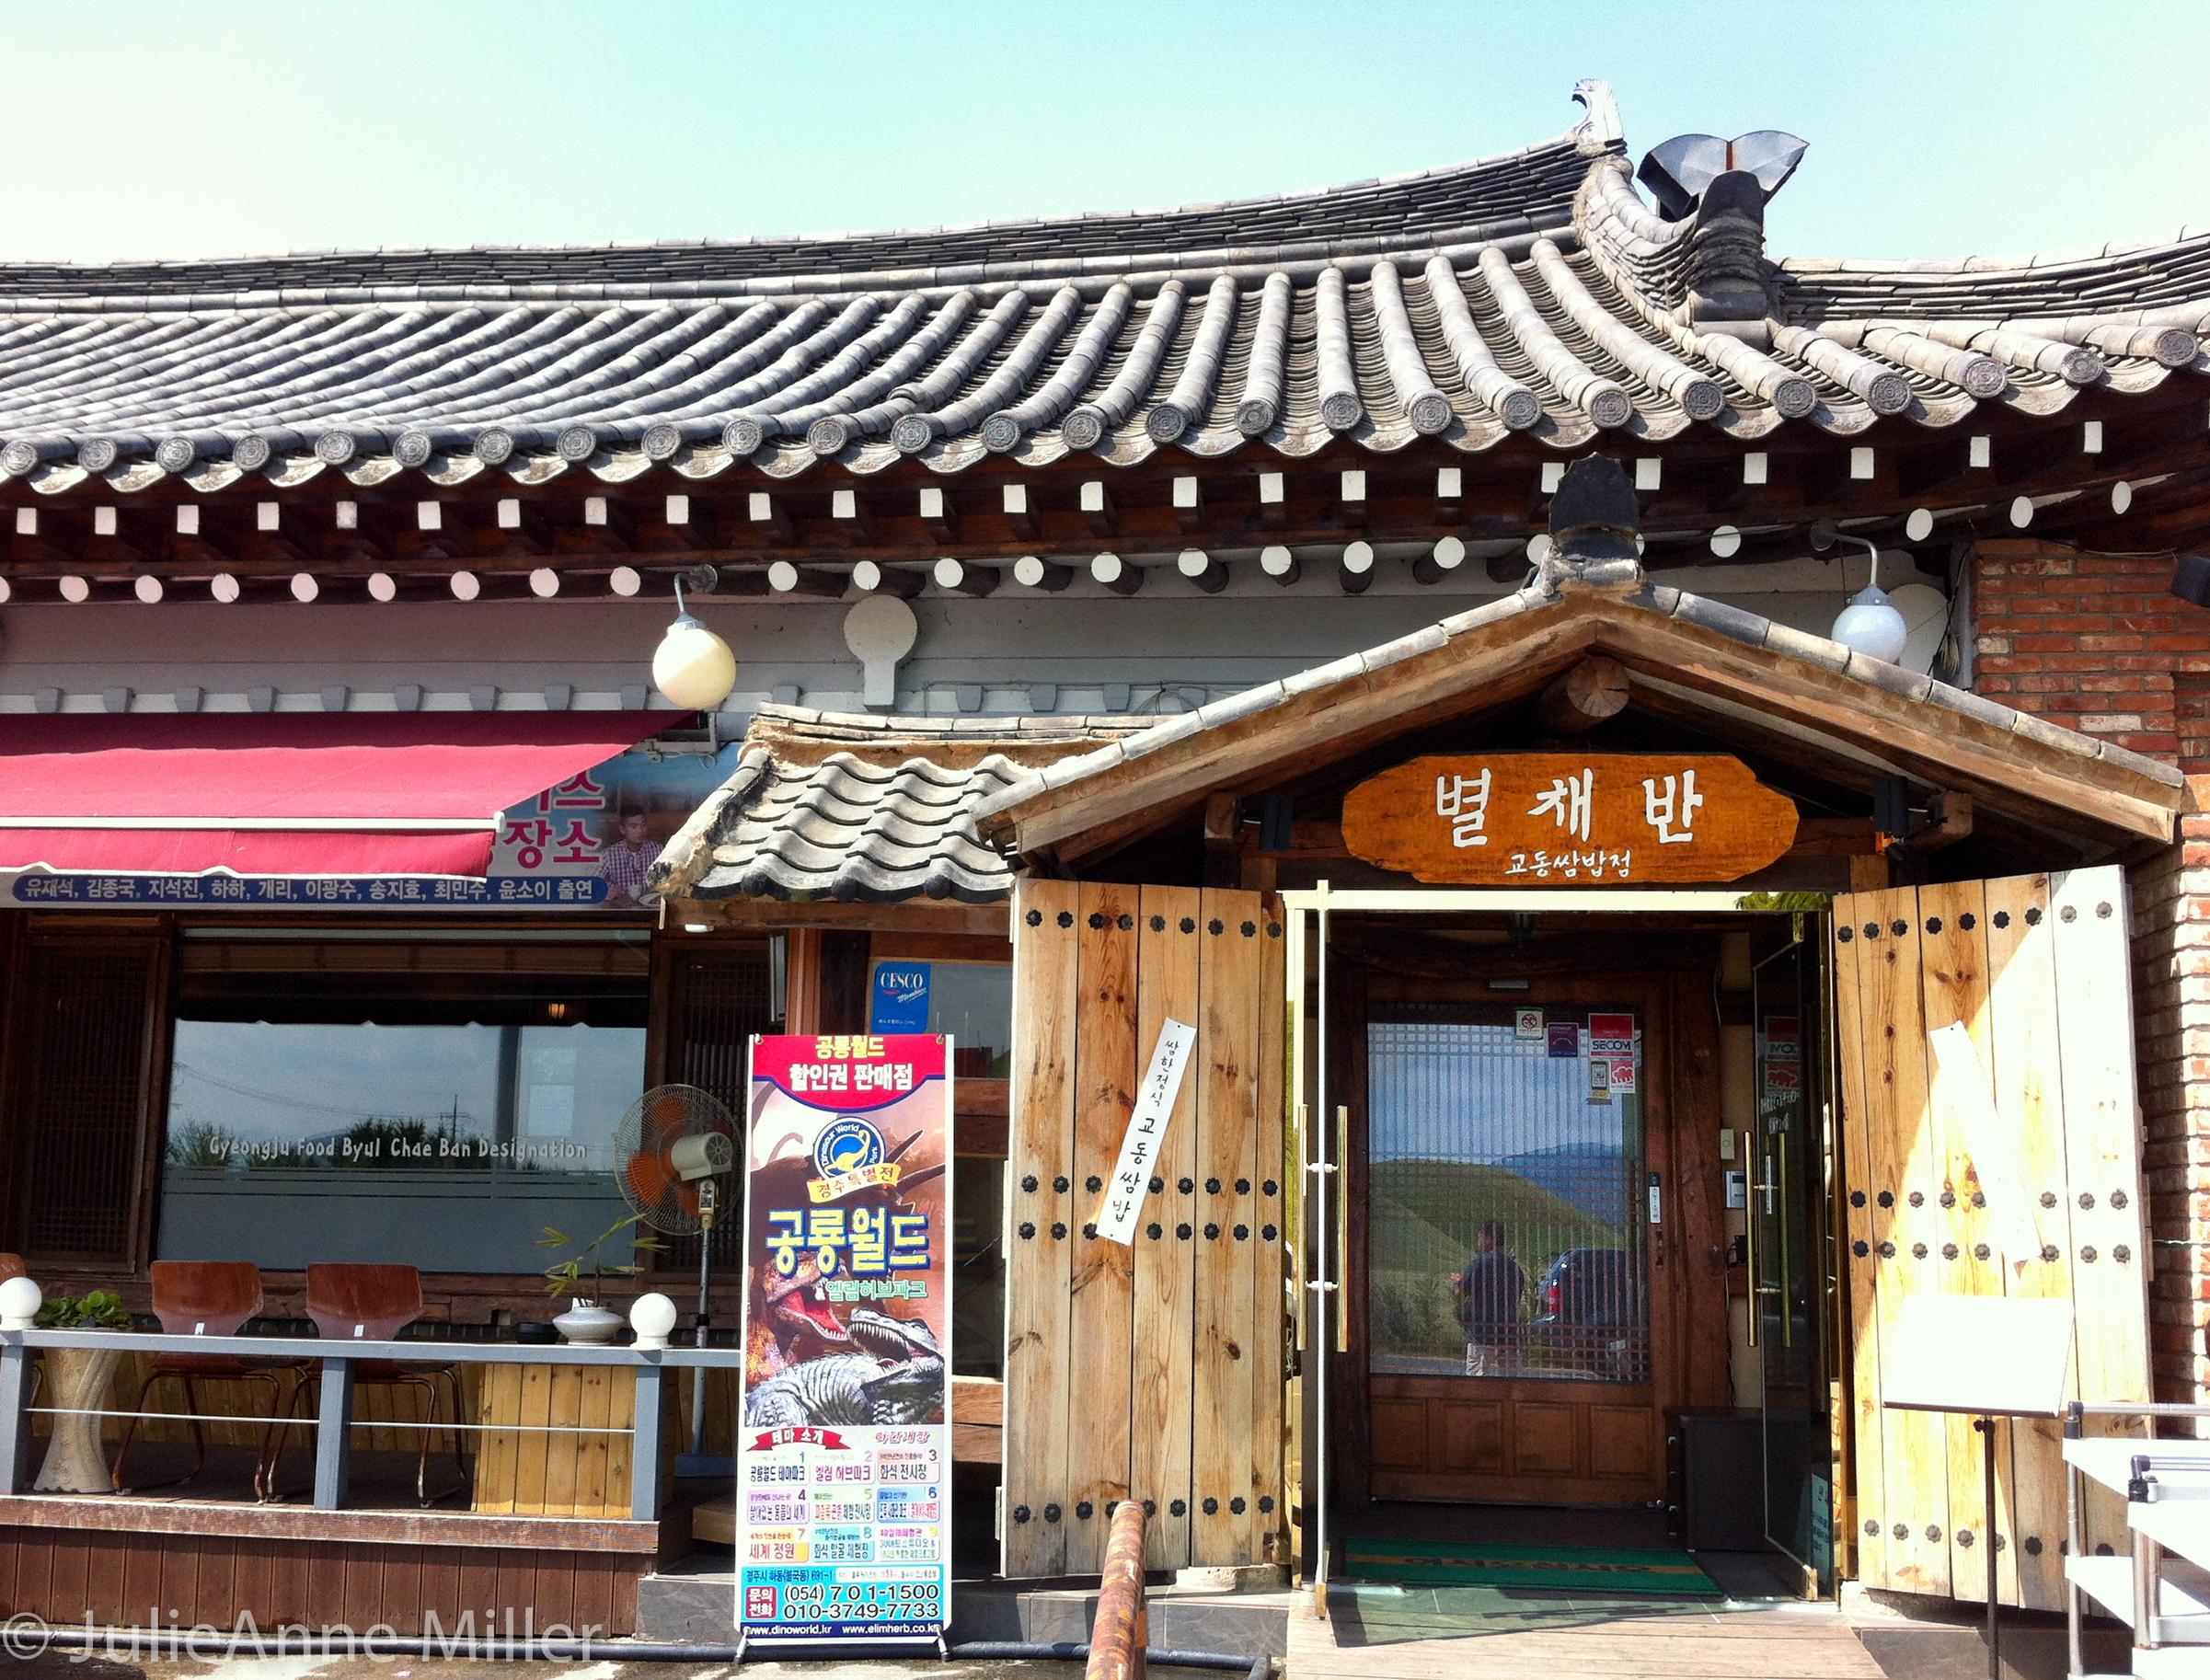 Byulchaeban restaurant